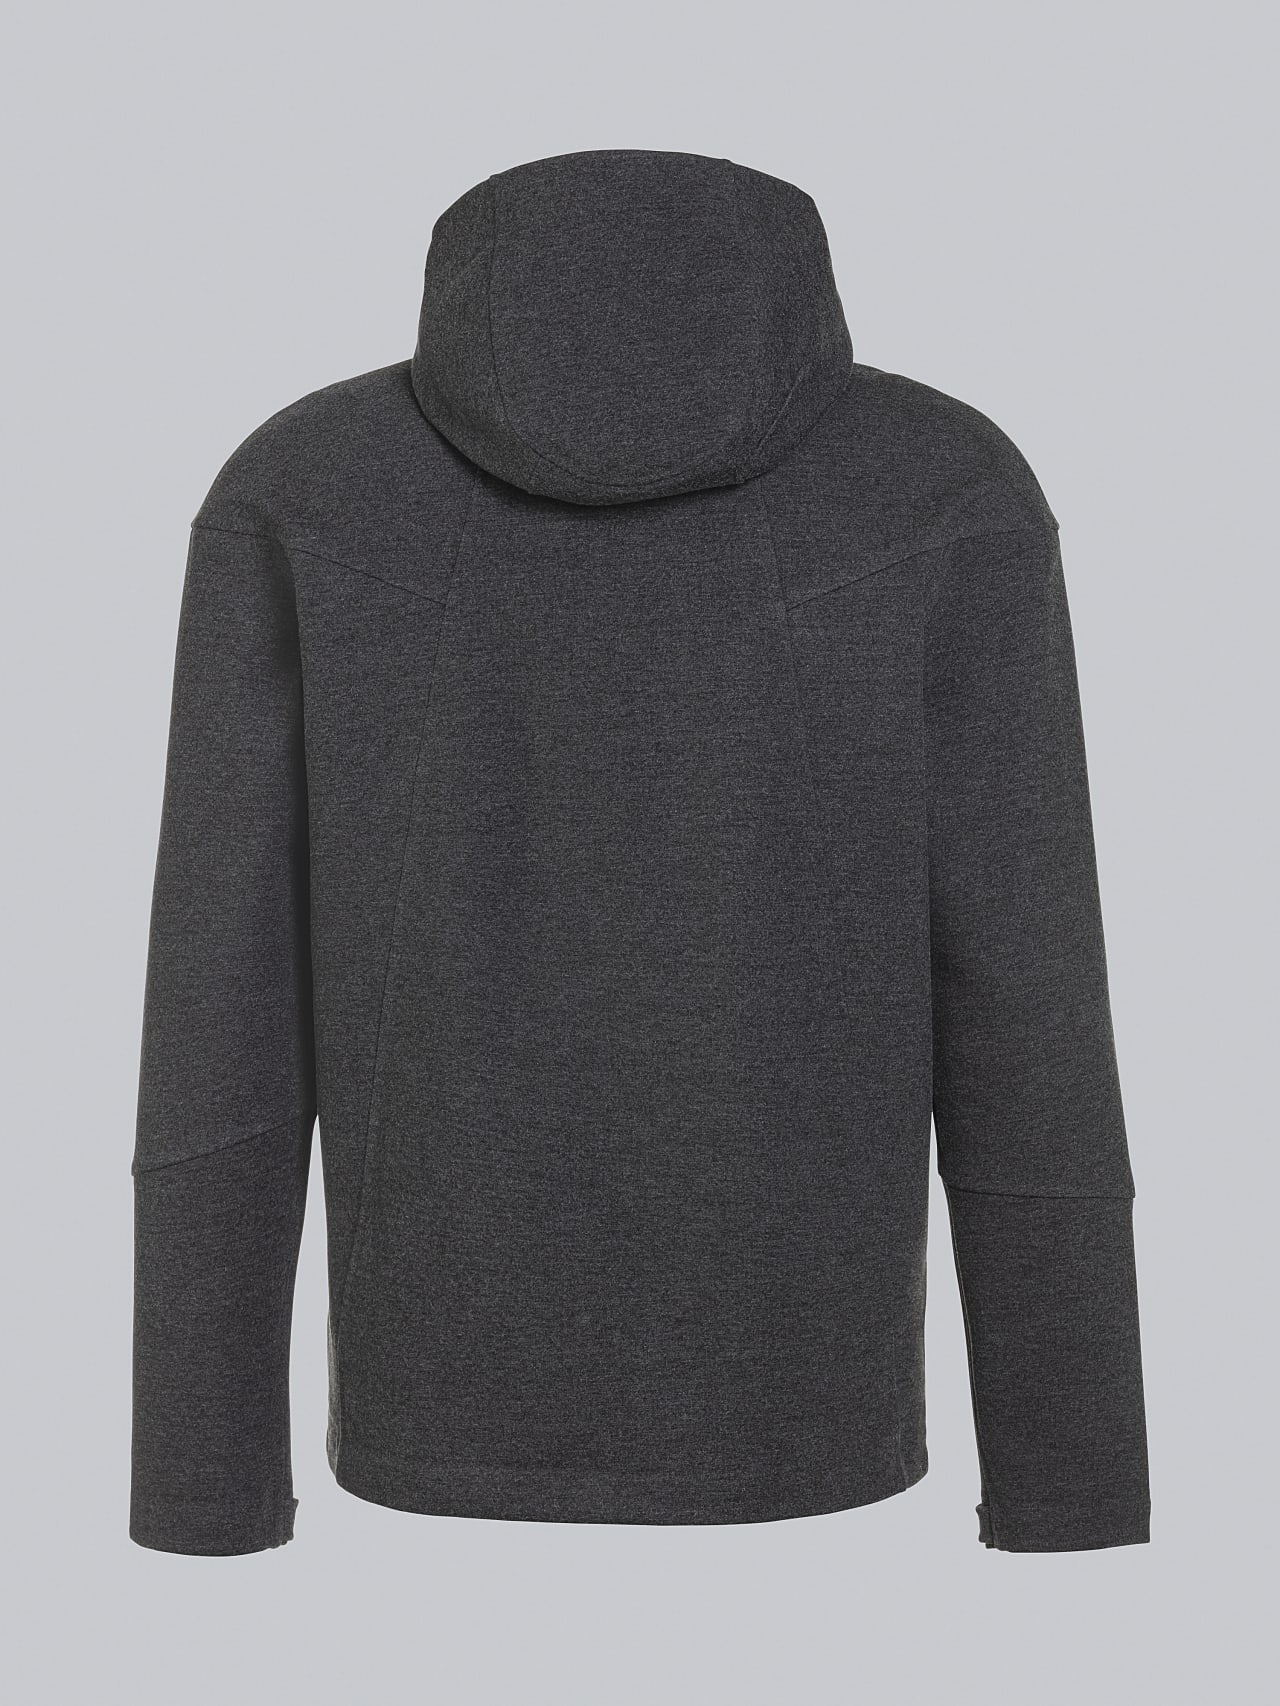 SROTE V1.Y5.02 Waterproof Sweatjacket dark grey / anthracite Left Alpha Tauri